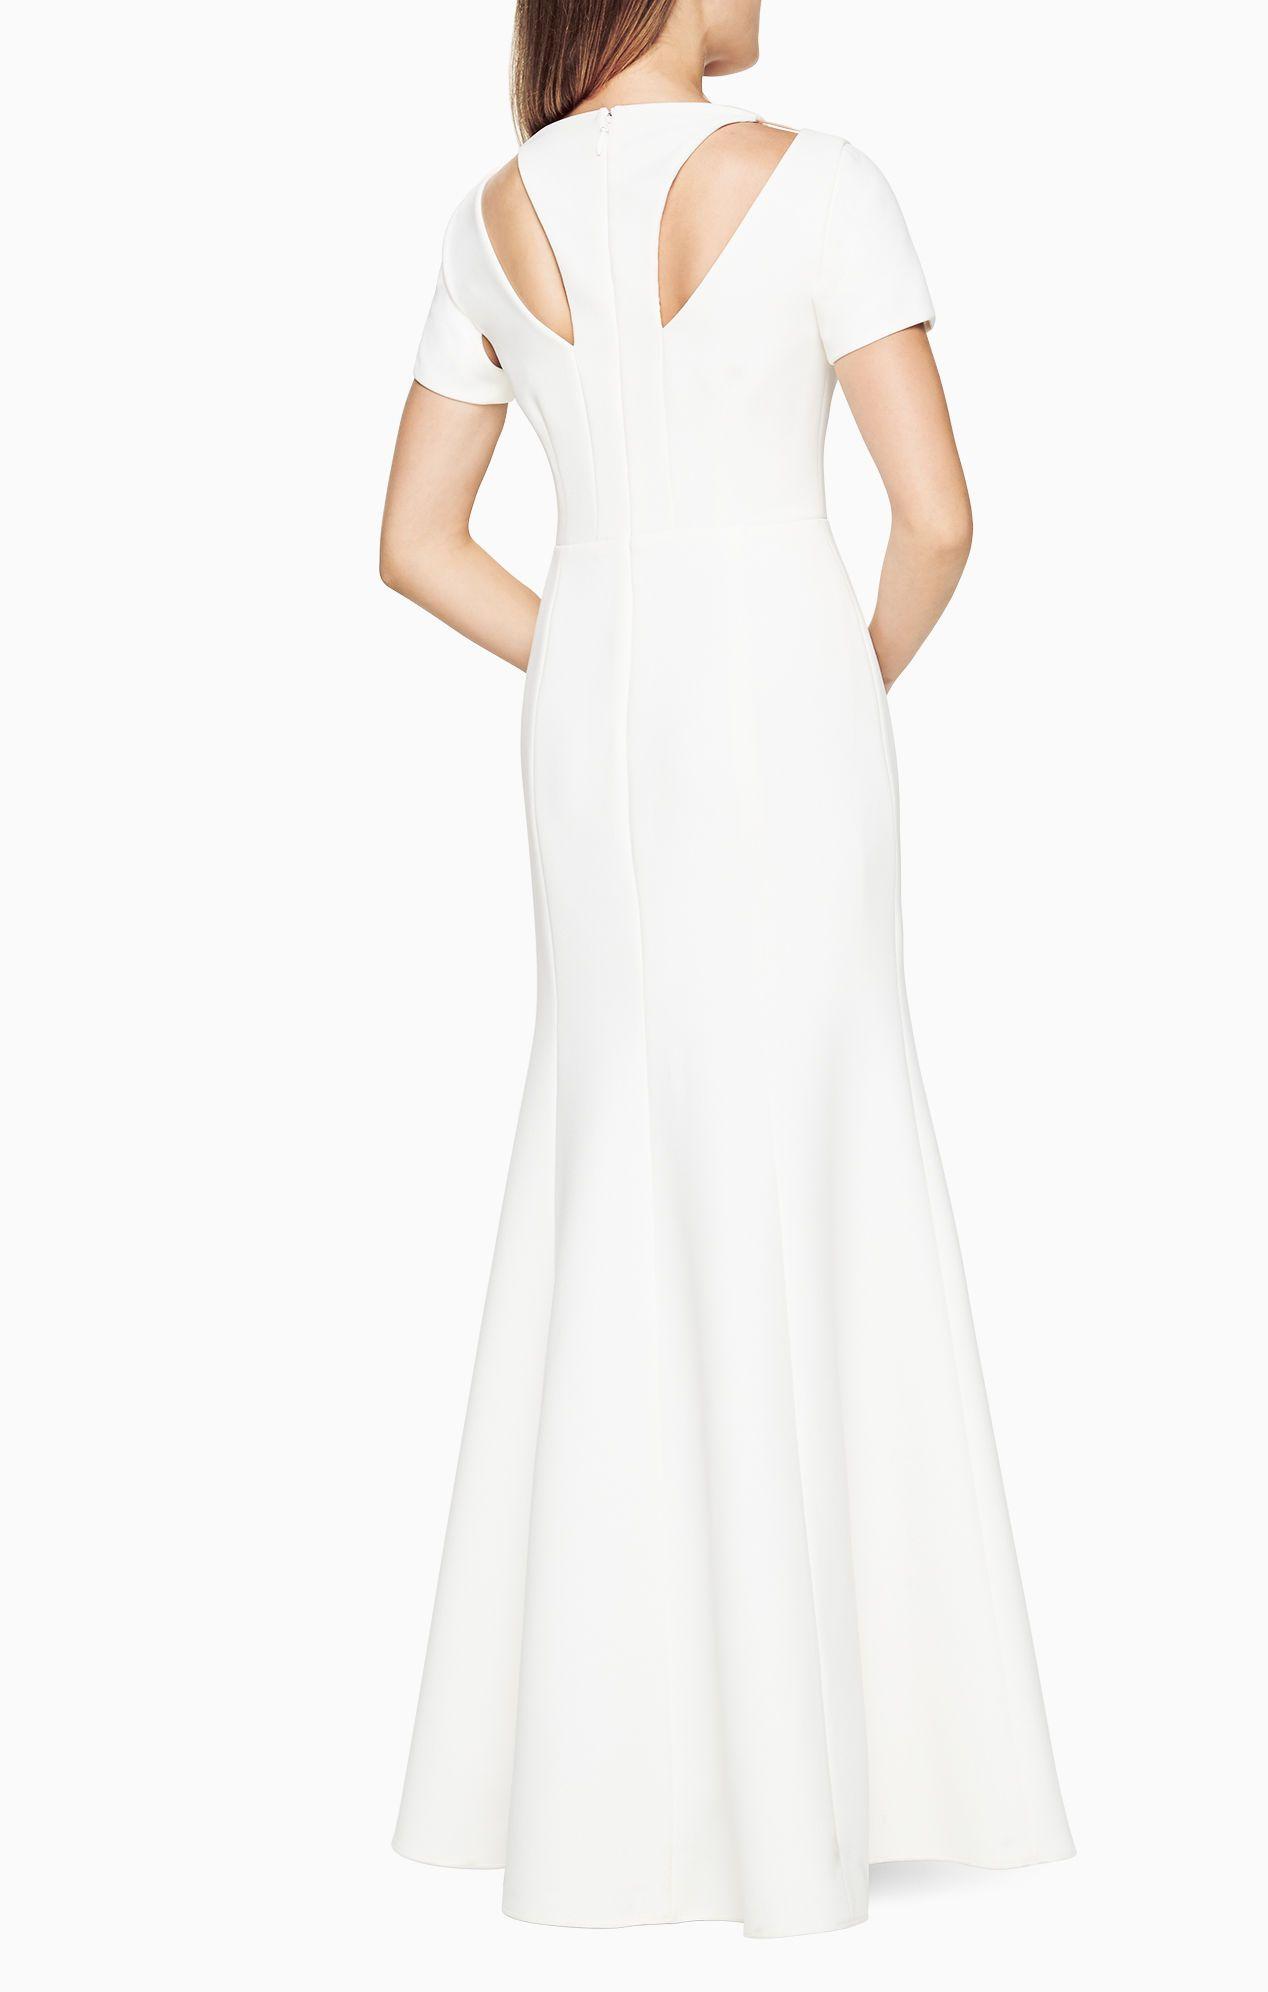 Estrella Cutout Gown | Robes Longueur Thé | Pinterest | Gowns and ...